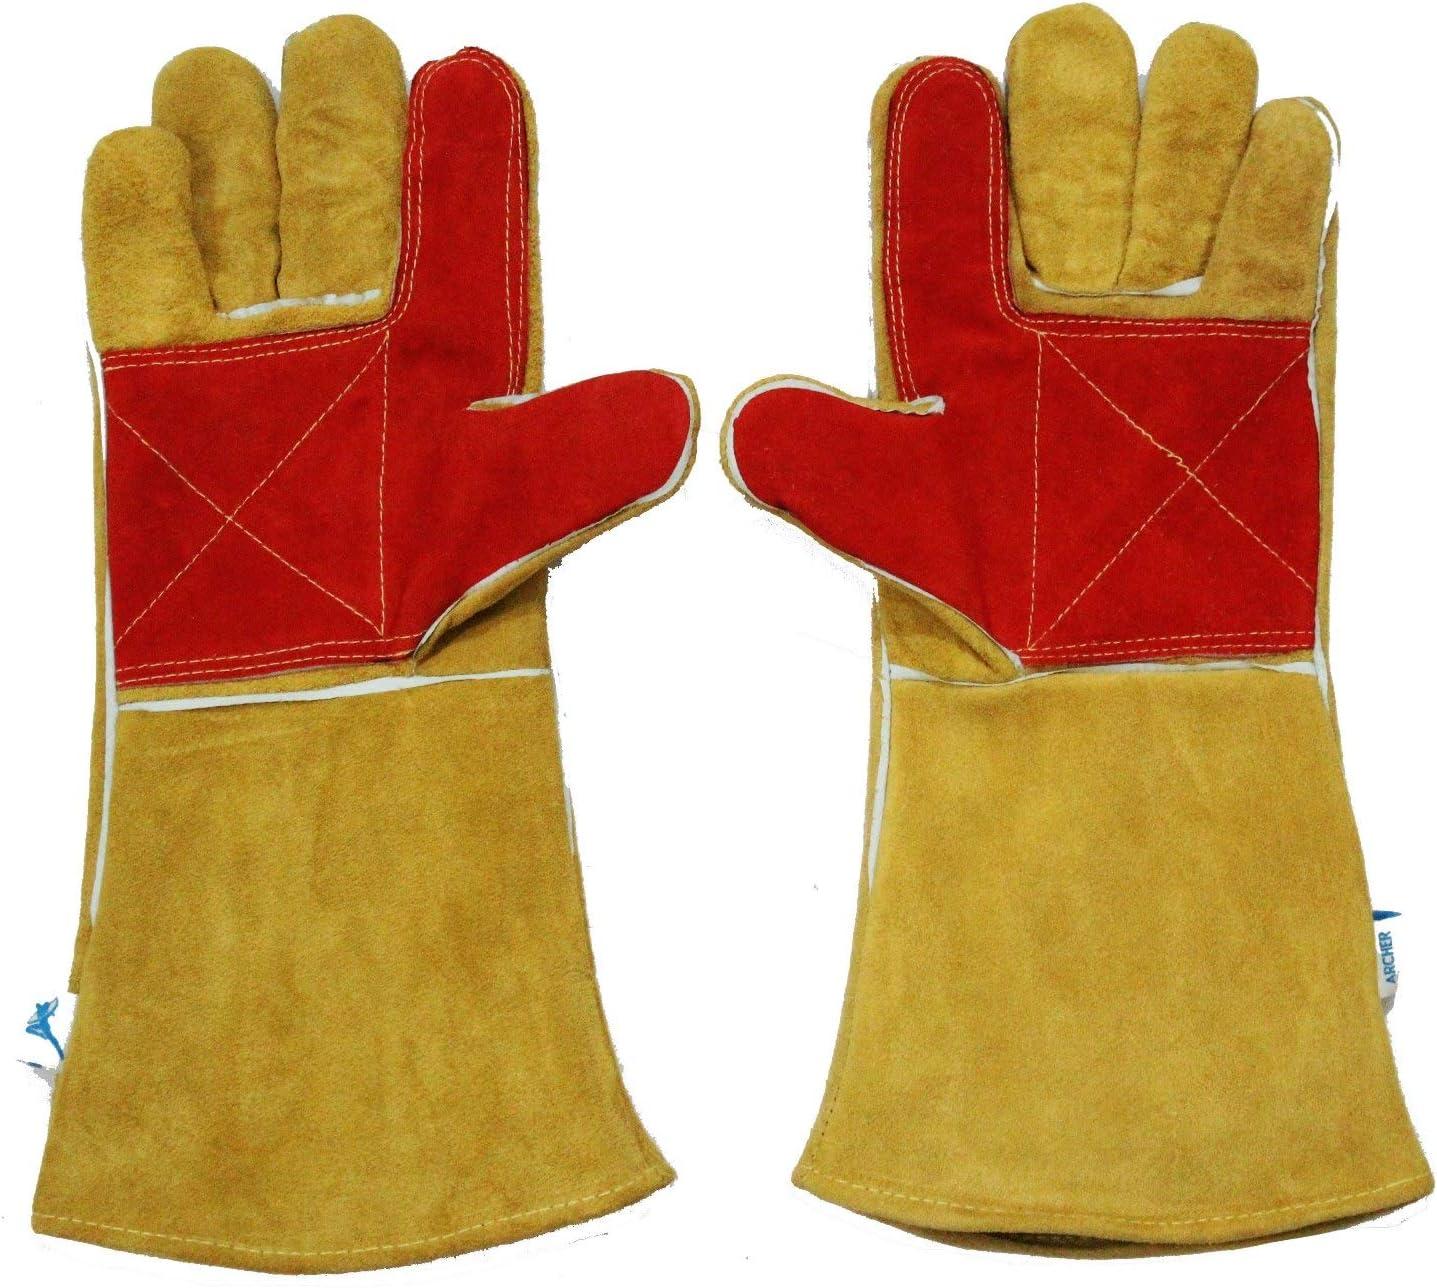 Archer Welding Gloves High Temperature Idea New San Antonio Mall color Resistant Heavy Duty